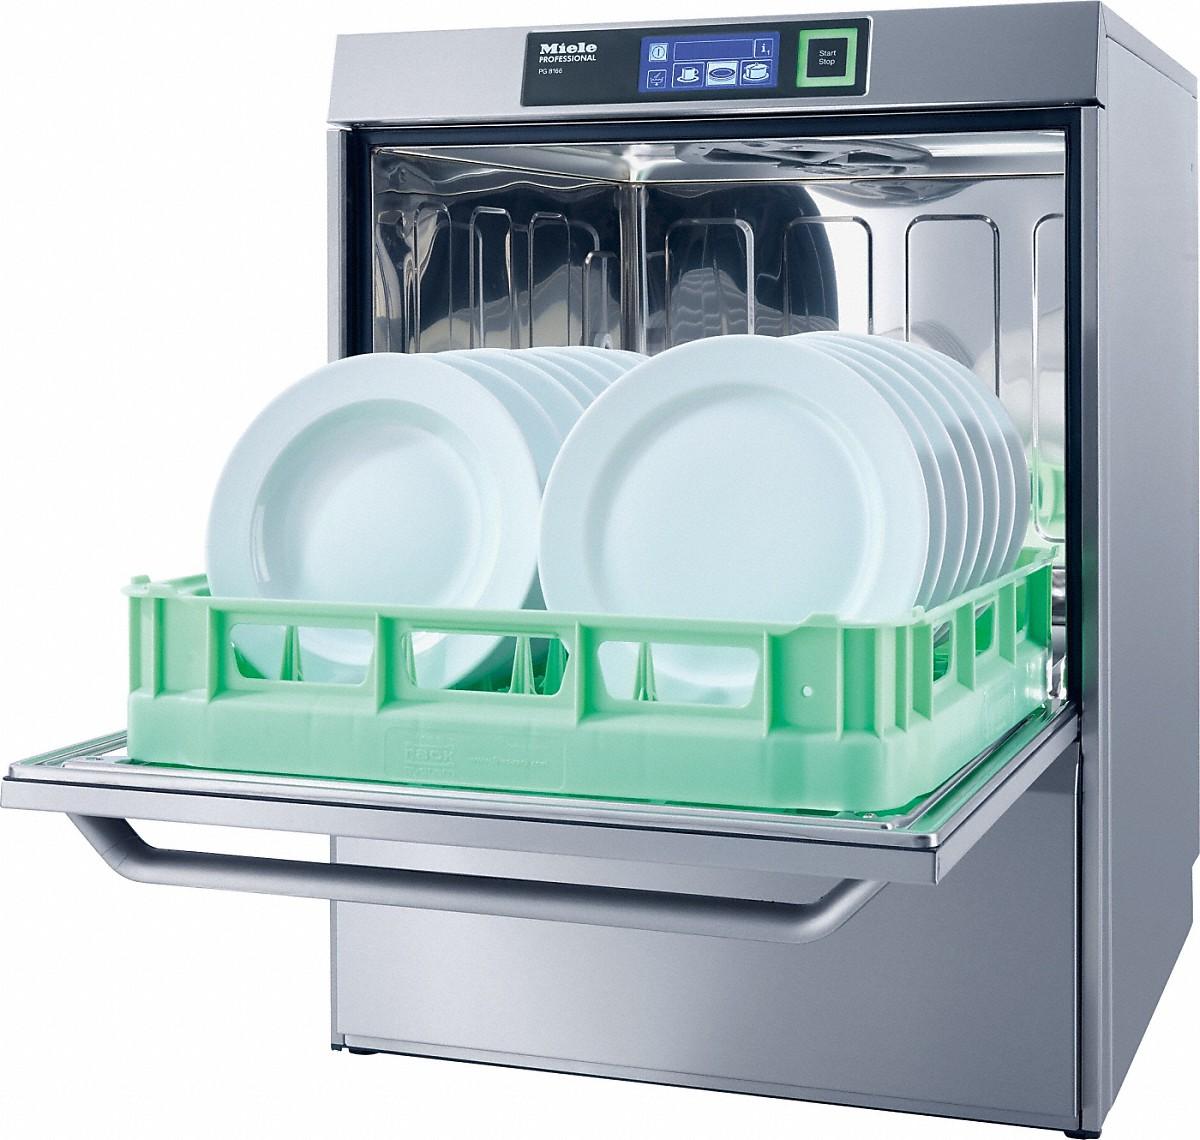 miele pg 8166 universal tank dishwasher. Black Bedroom Furniture Sets. Home Design Ideas